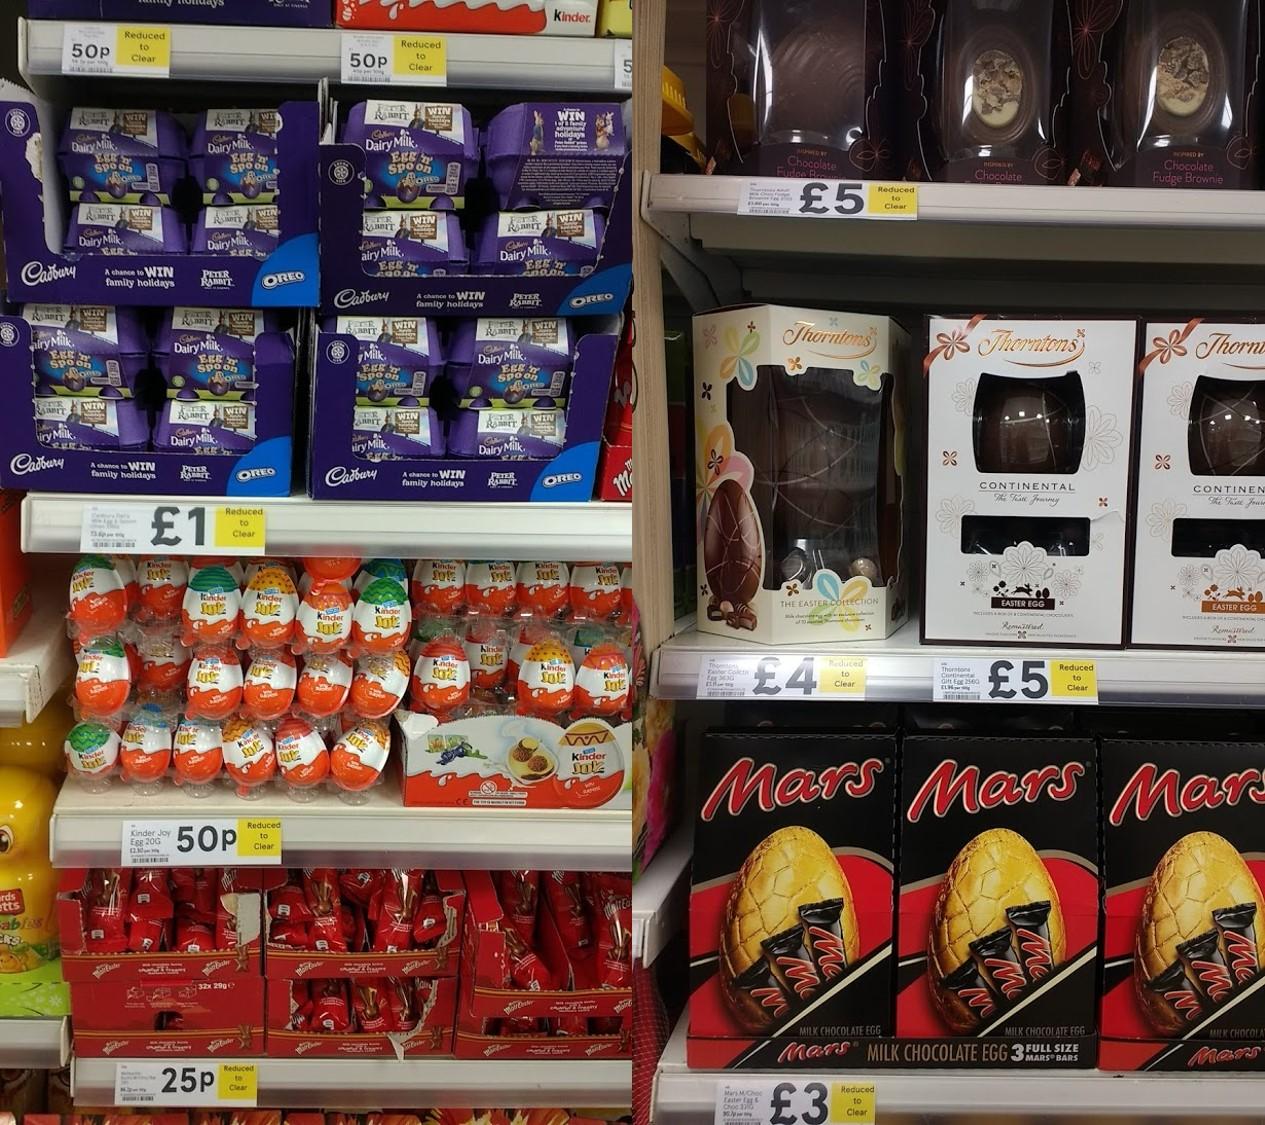 Easter Egg reductions in Tesco